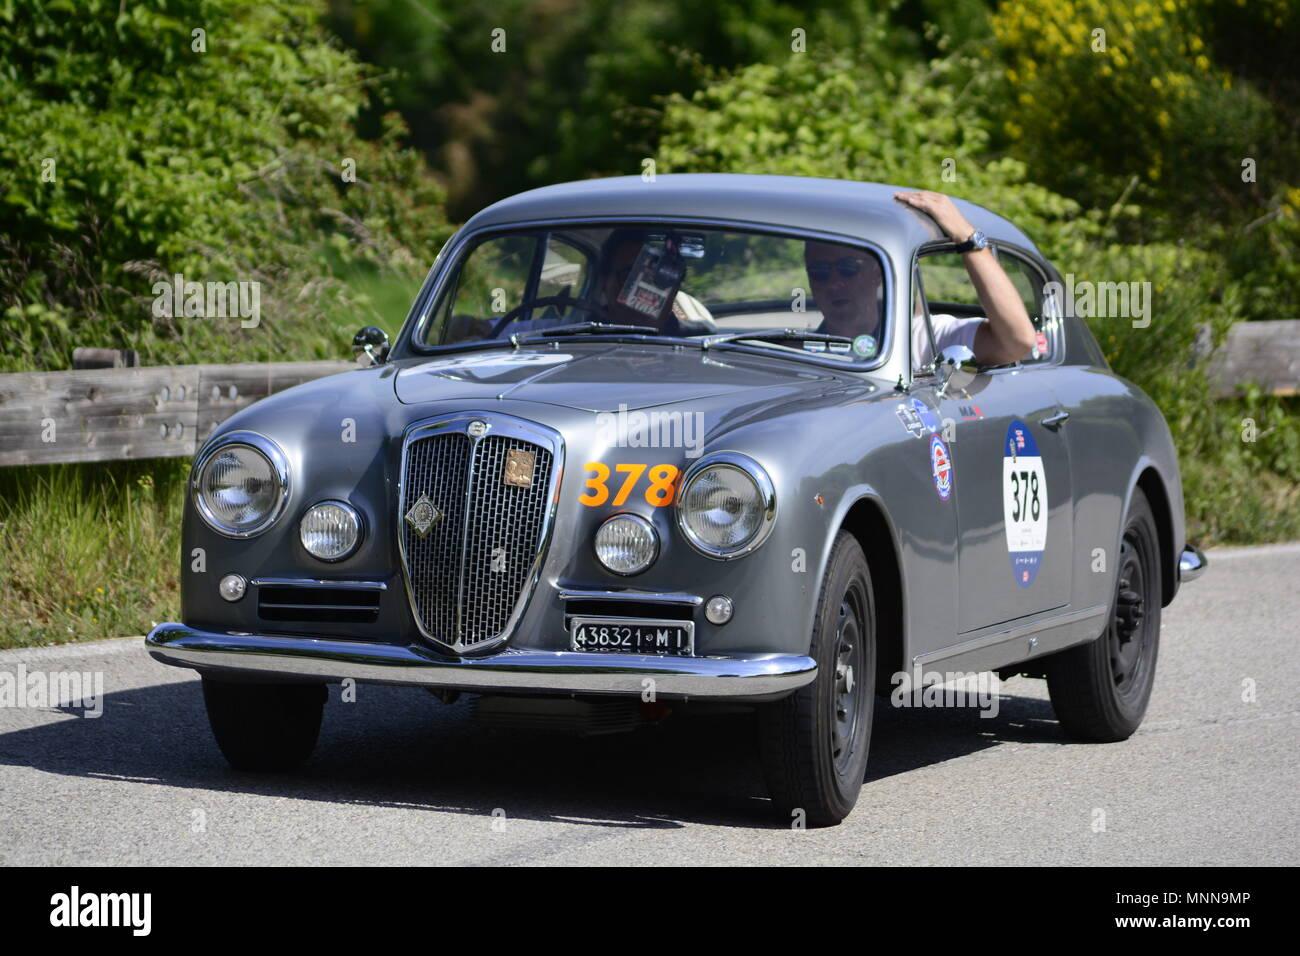 PESARO COLLE SAN BARTOLO , ITALY - MAY 17 - 2018 : LANCIA AURELIA B20 GT1957 on an old racing car in rally Mille Miglia 2018 the famous italia - Stock Image